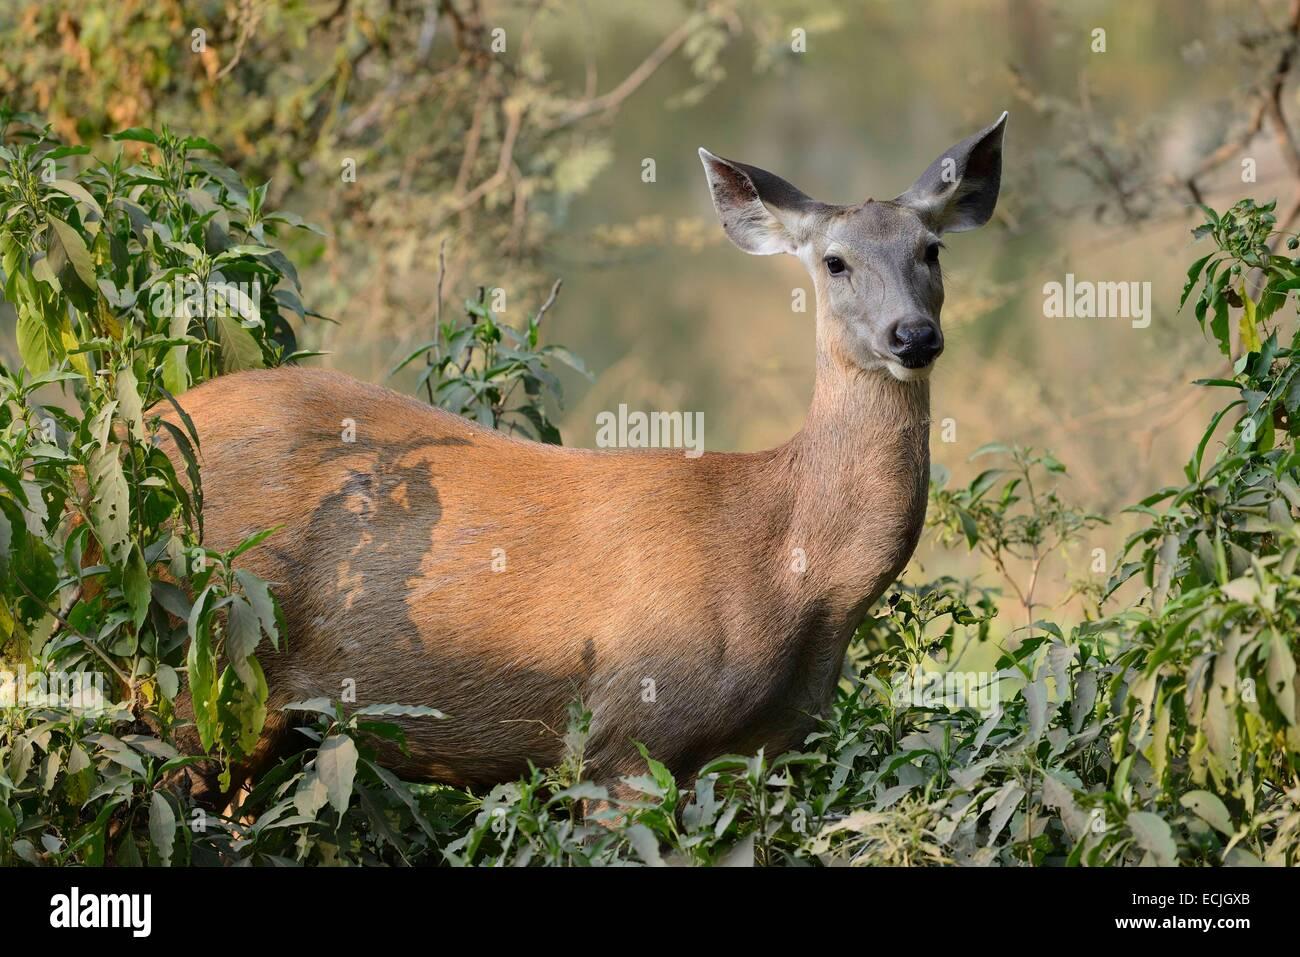 India Rajasthan, il Parco nazionale di Ranthambore, Femmina Nilgai antelope Immagini Stock